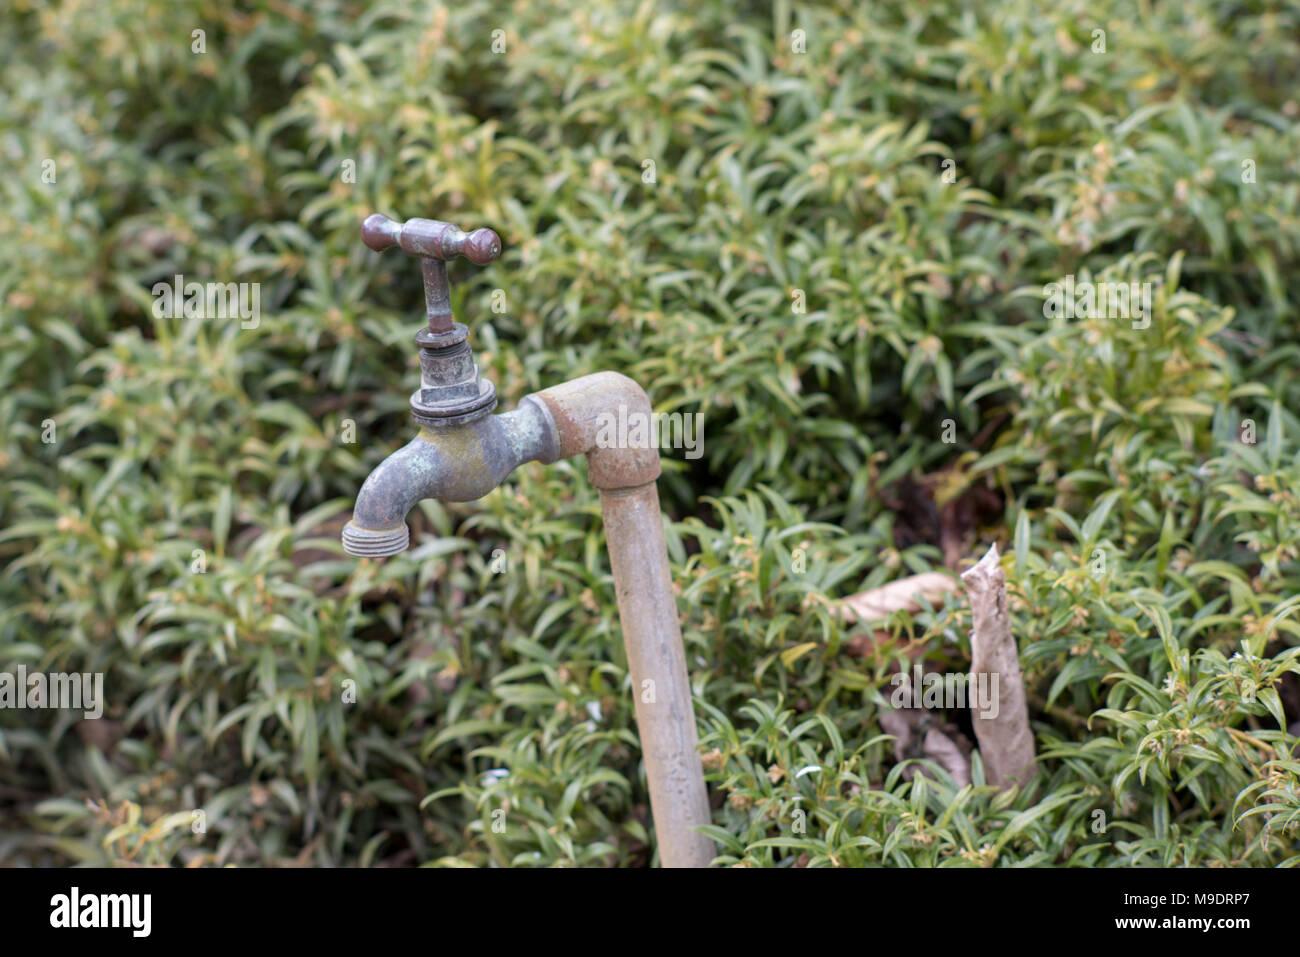 Funky Decorative Garden Faucets Gift - Water Faucet Ideas - rirakuya ...